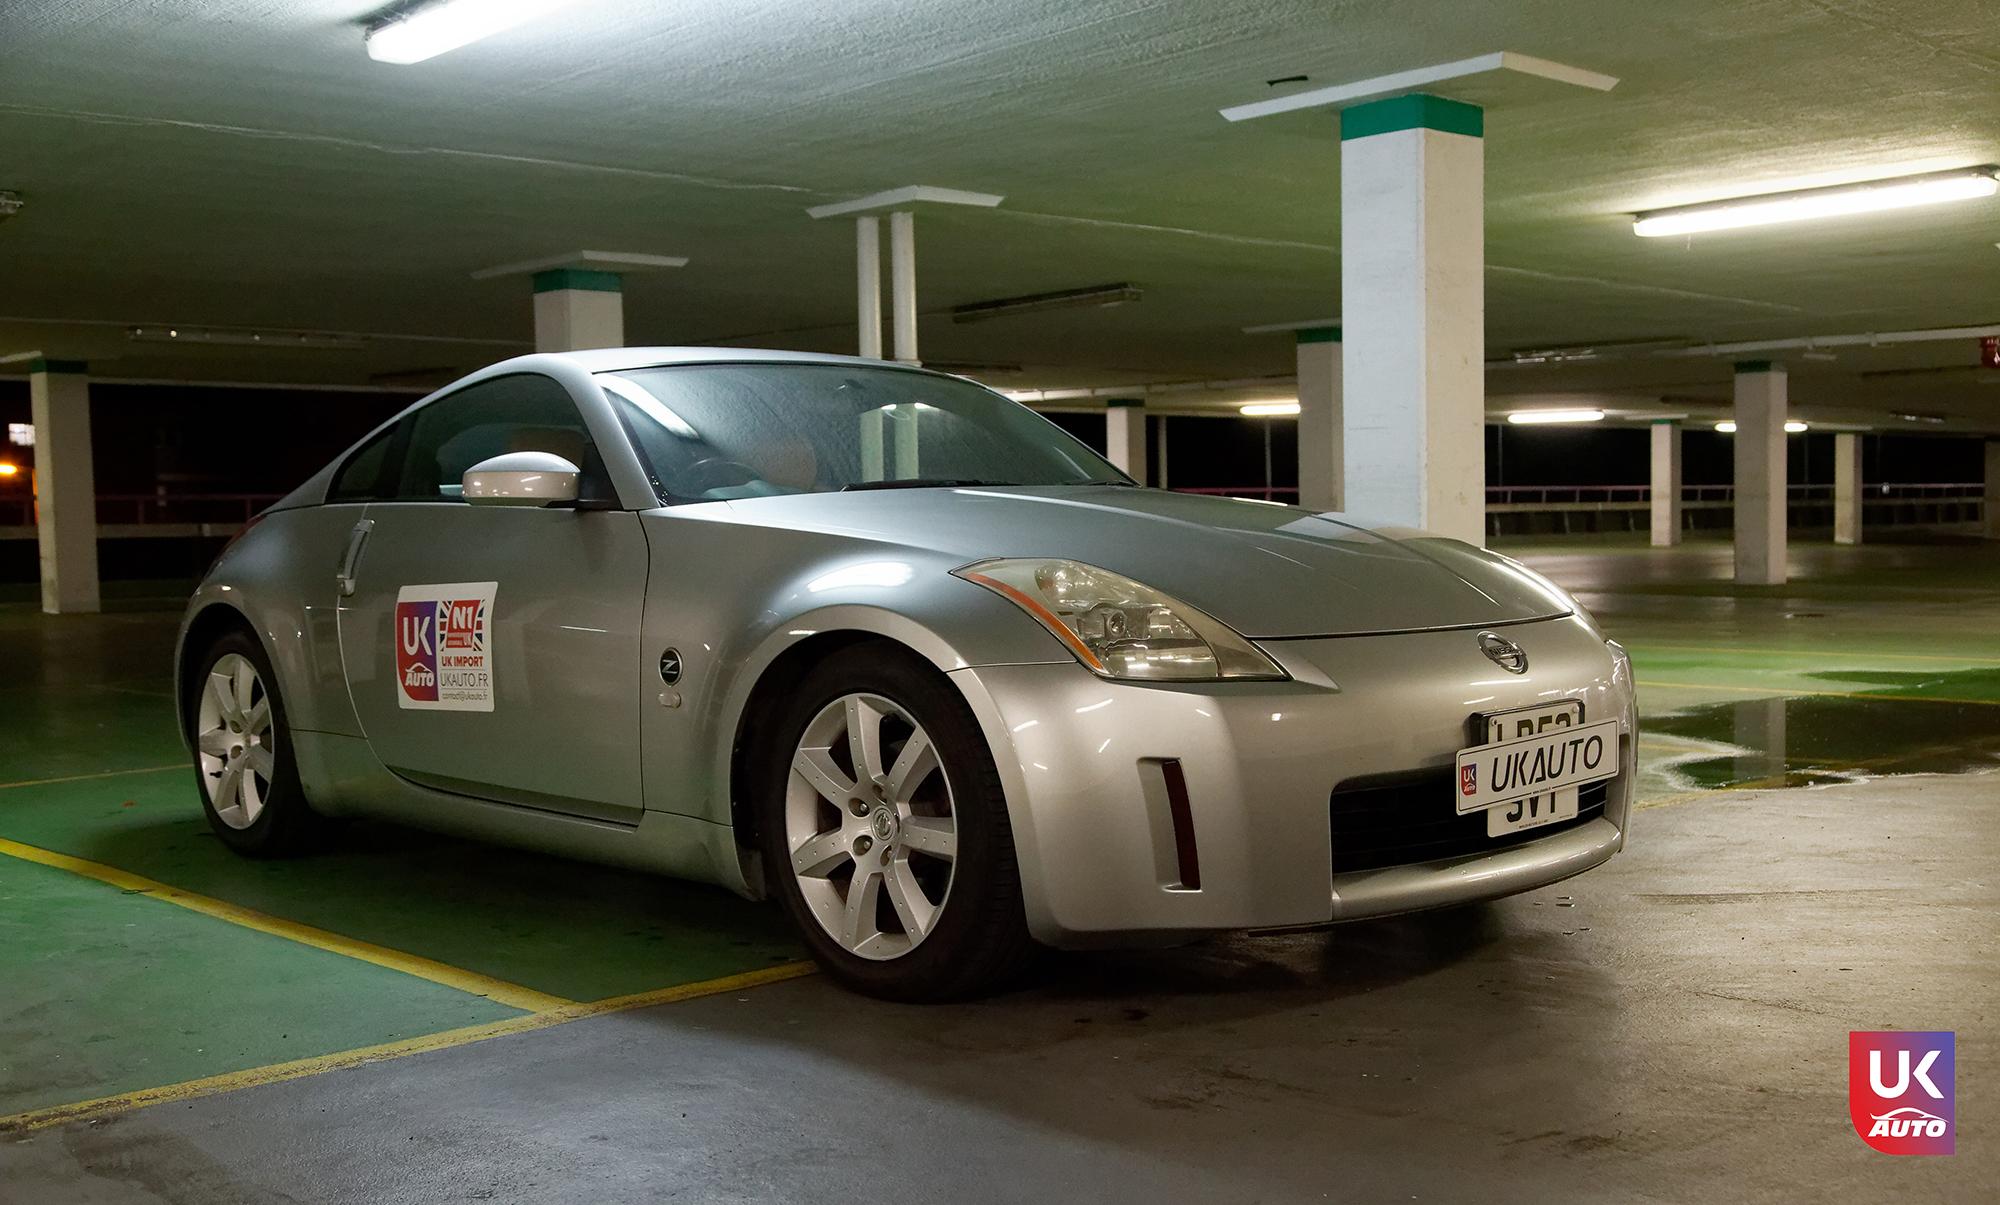 Ukauto import nissan 350z jdm import fairlady v6 import uk ukauto rhd nissan import uk1 - Import Nissan 350Z JDM IMPORT 3.5 V6 TIPTRONIC IMPORT AUTO par UKAUTO